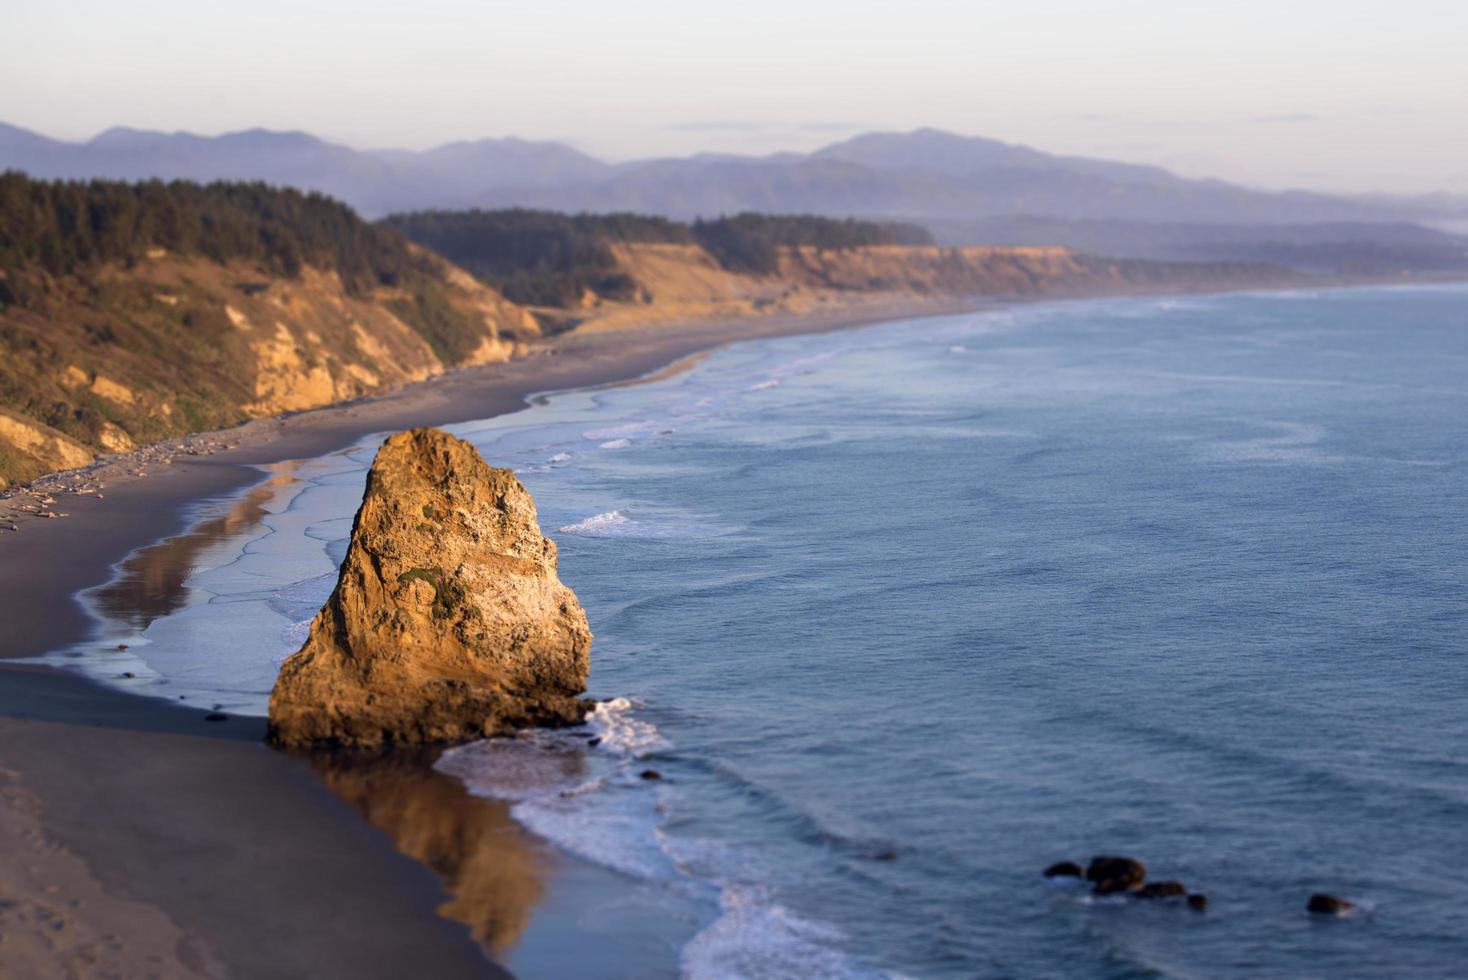 Rock formation on seashore photo